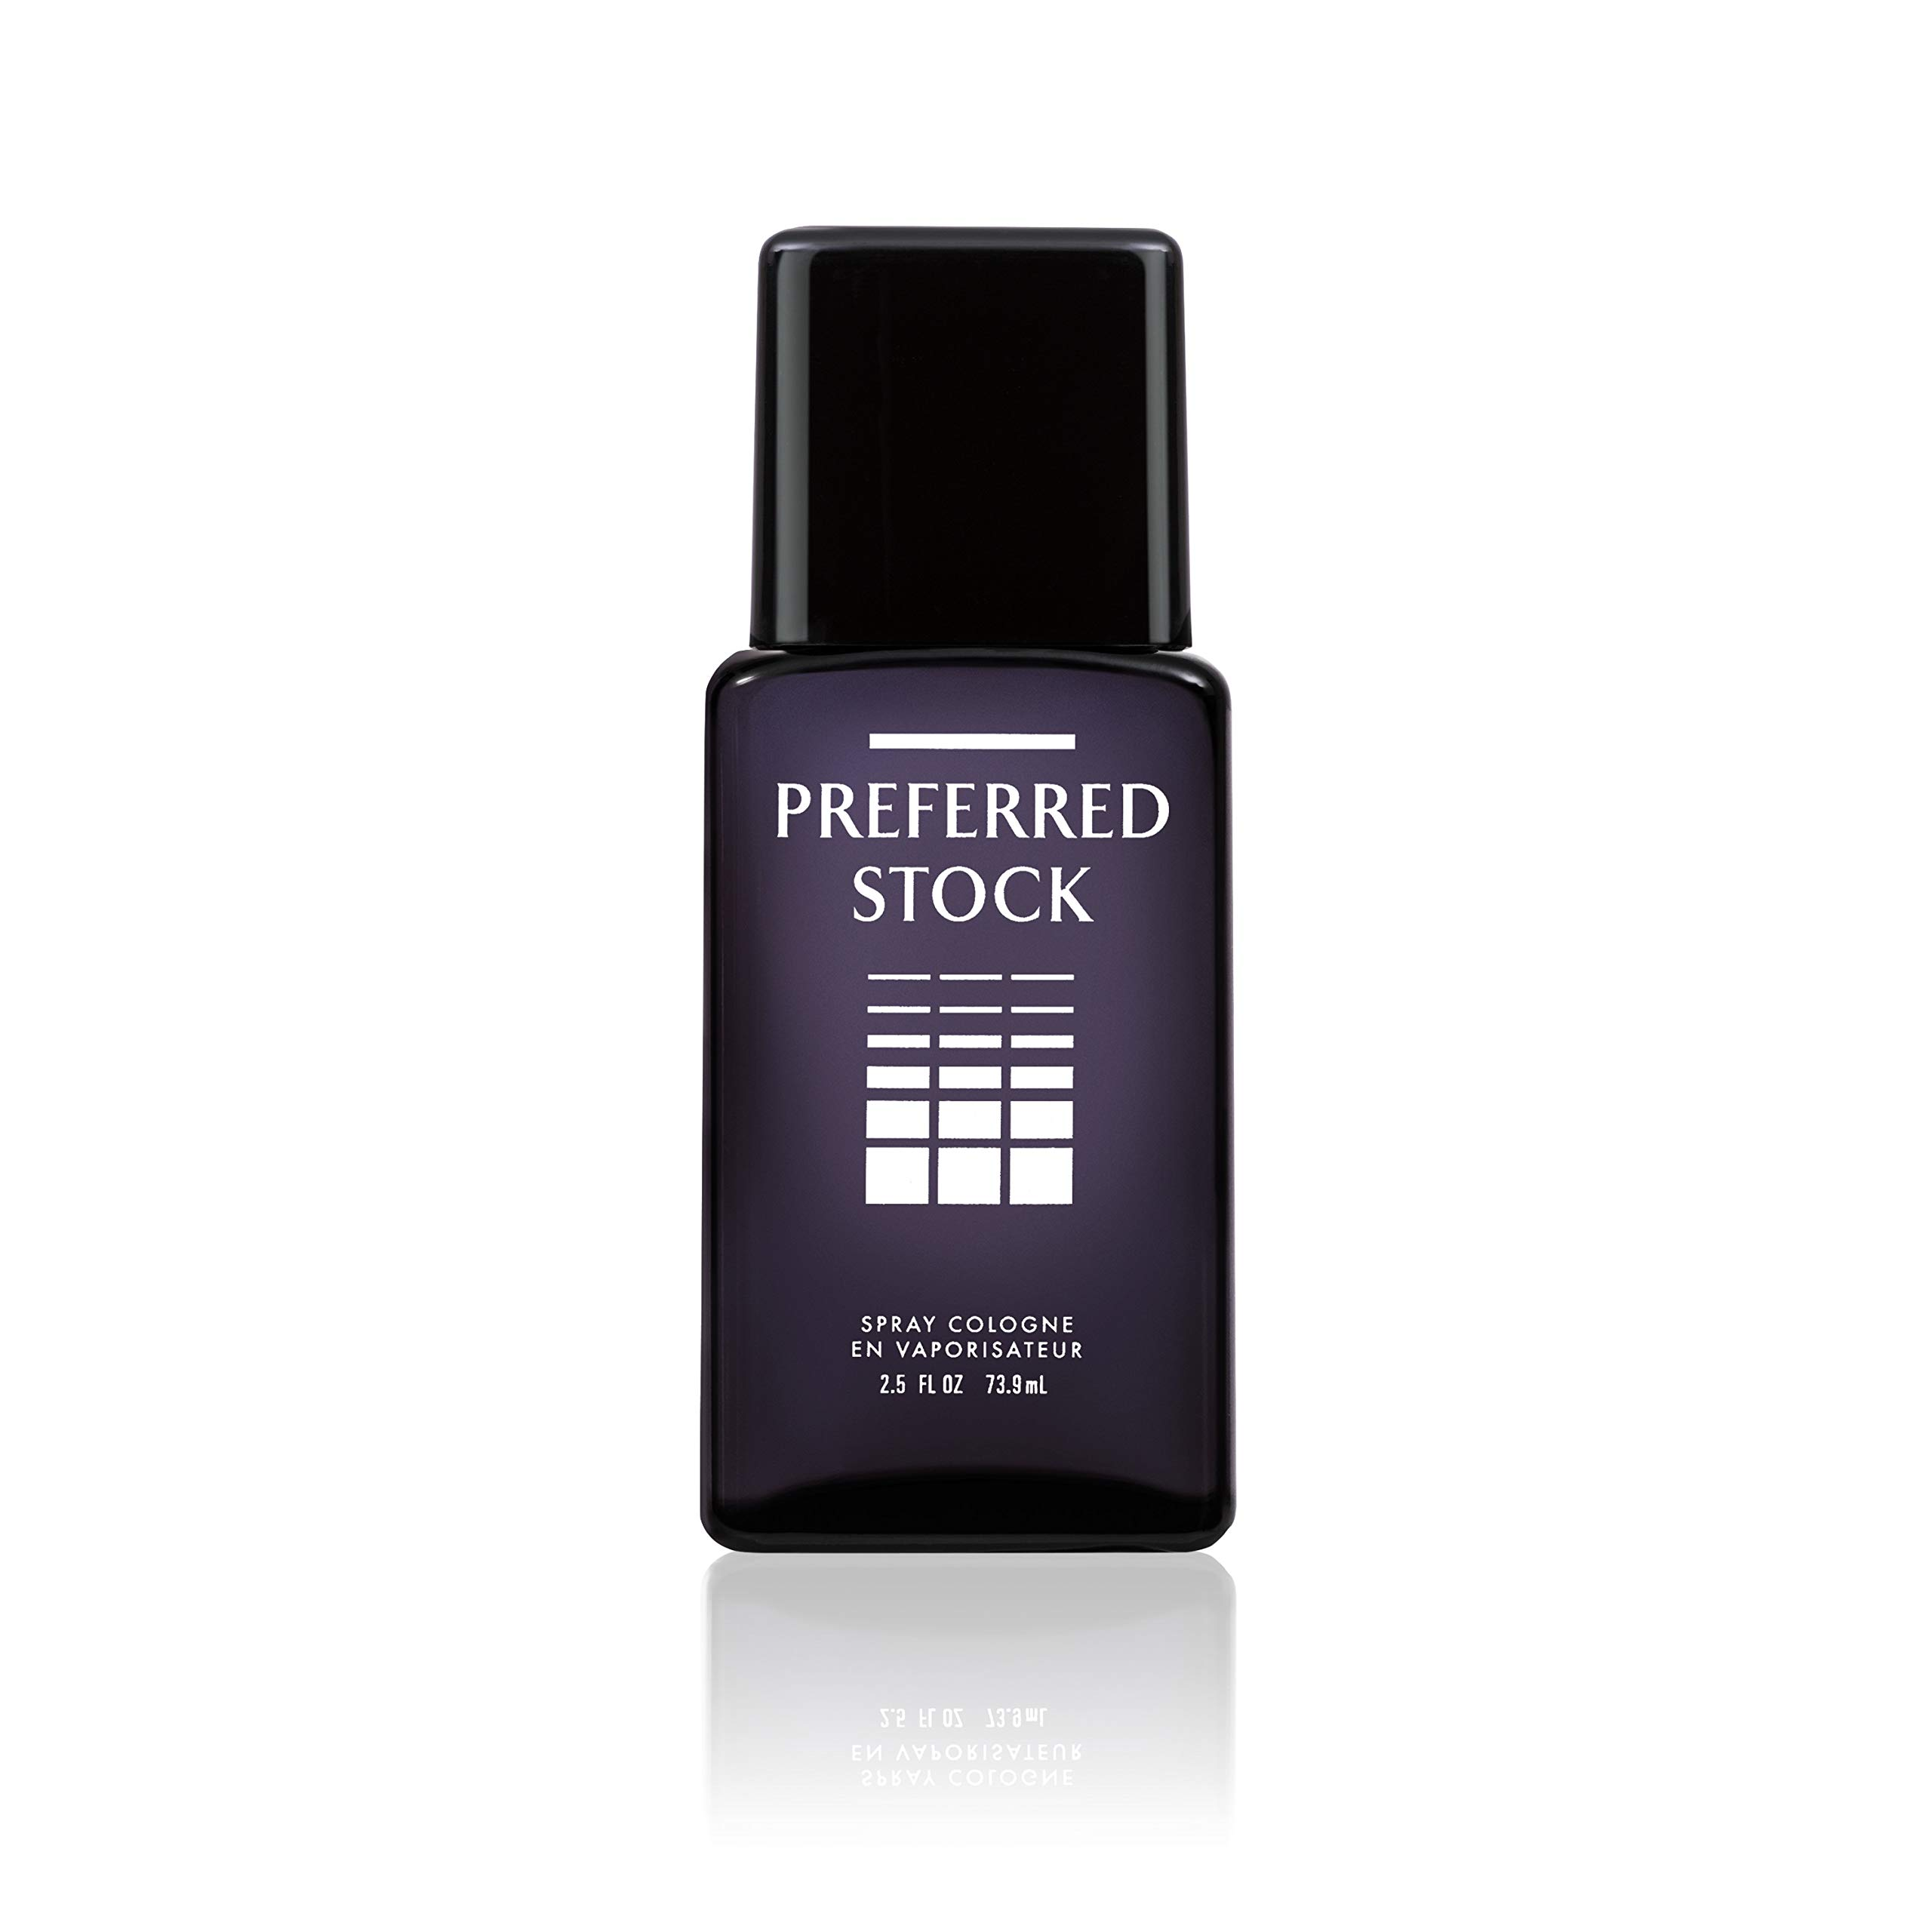 Stetson Preferred Stock Cologne Spray for Men by Stetson 2.5 Fluid Ounce Spray Bottle A Sophisticated Blend of Sandalwood, Vetiver & Citrus